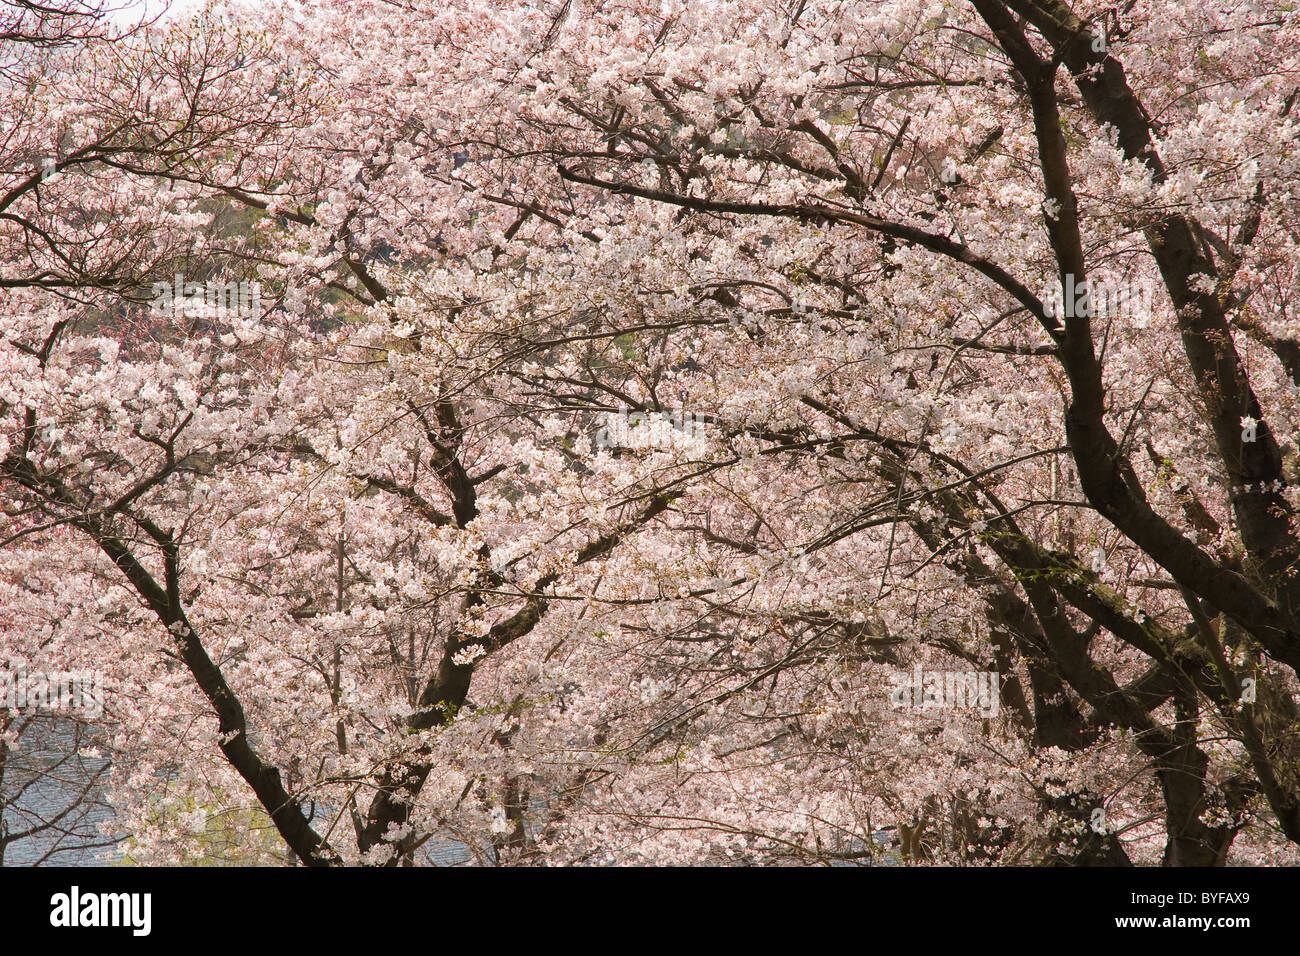 Blick durch blühende japanische Kirschbäume blühen während Hanami. Stockbild